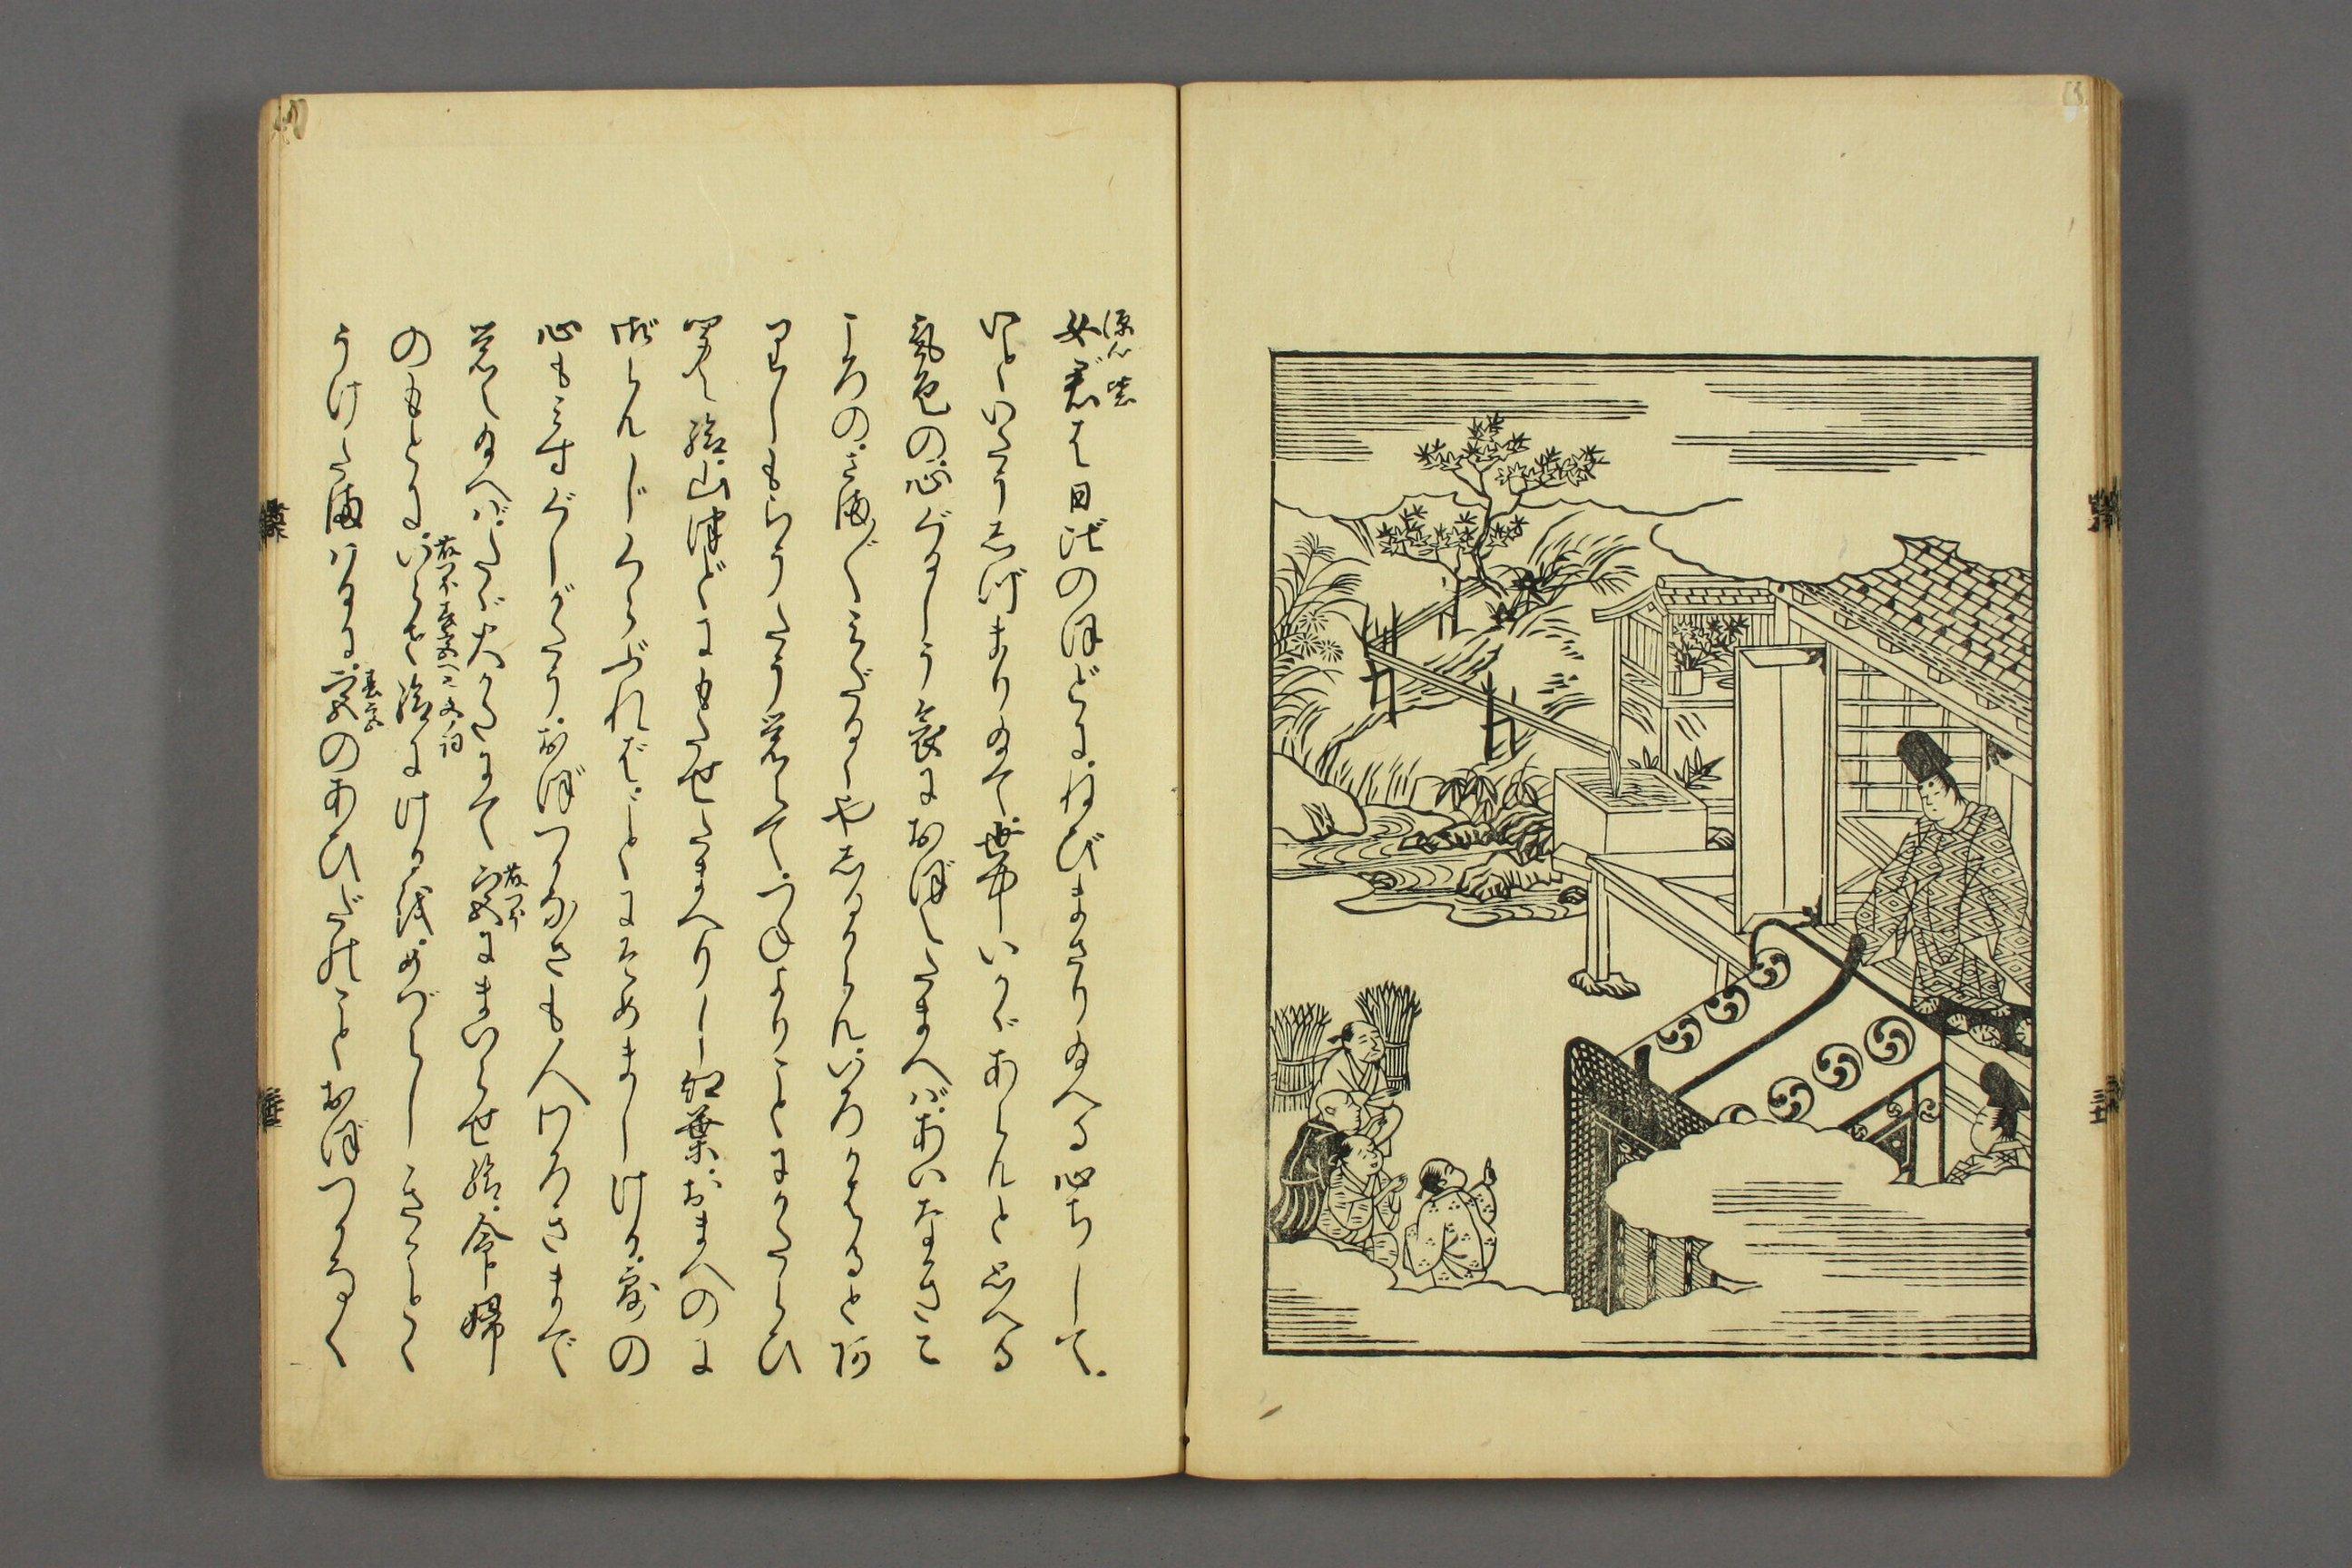 http://archive.wul.waseda.ac.jp/kosho/bunko30/bunko30_a0007/bunko30_a0007_0010/bunko30_a0007_0010_p0033.jpg